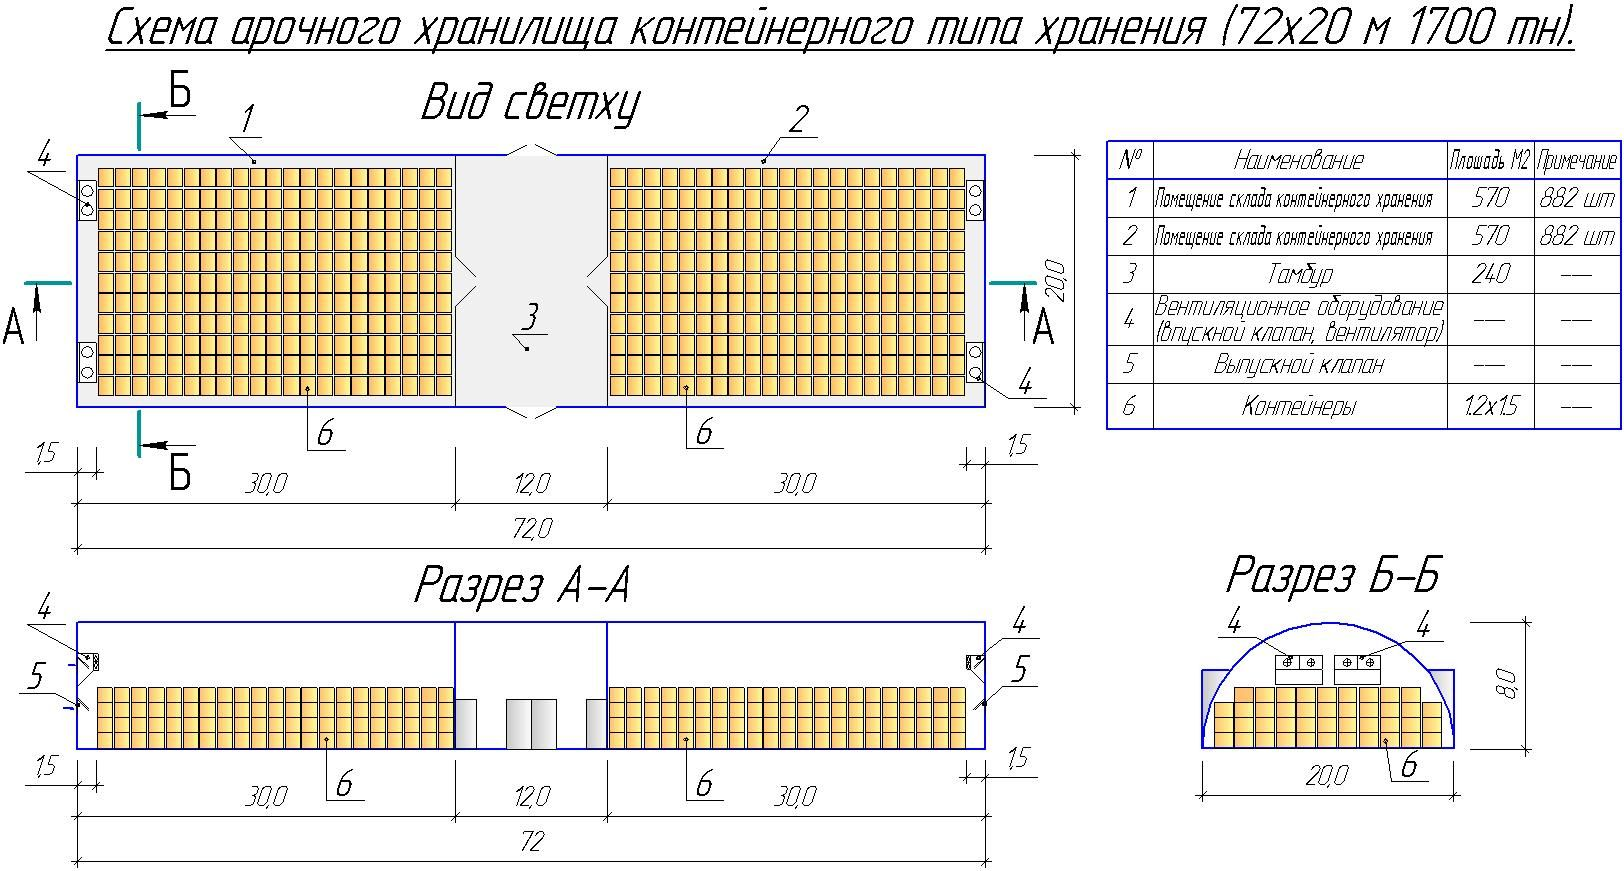 Схема размещения зерна в хранилище